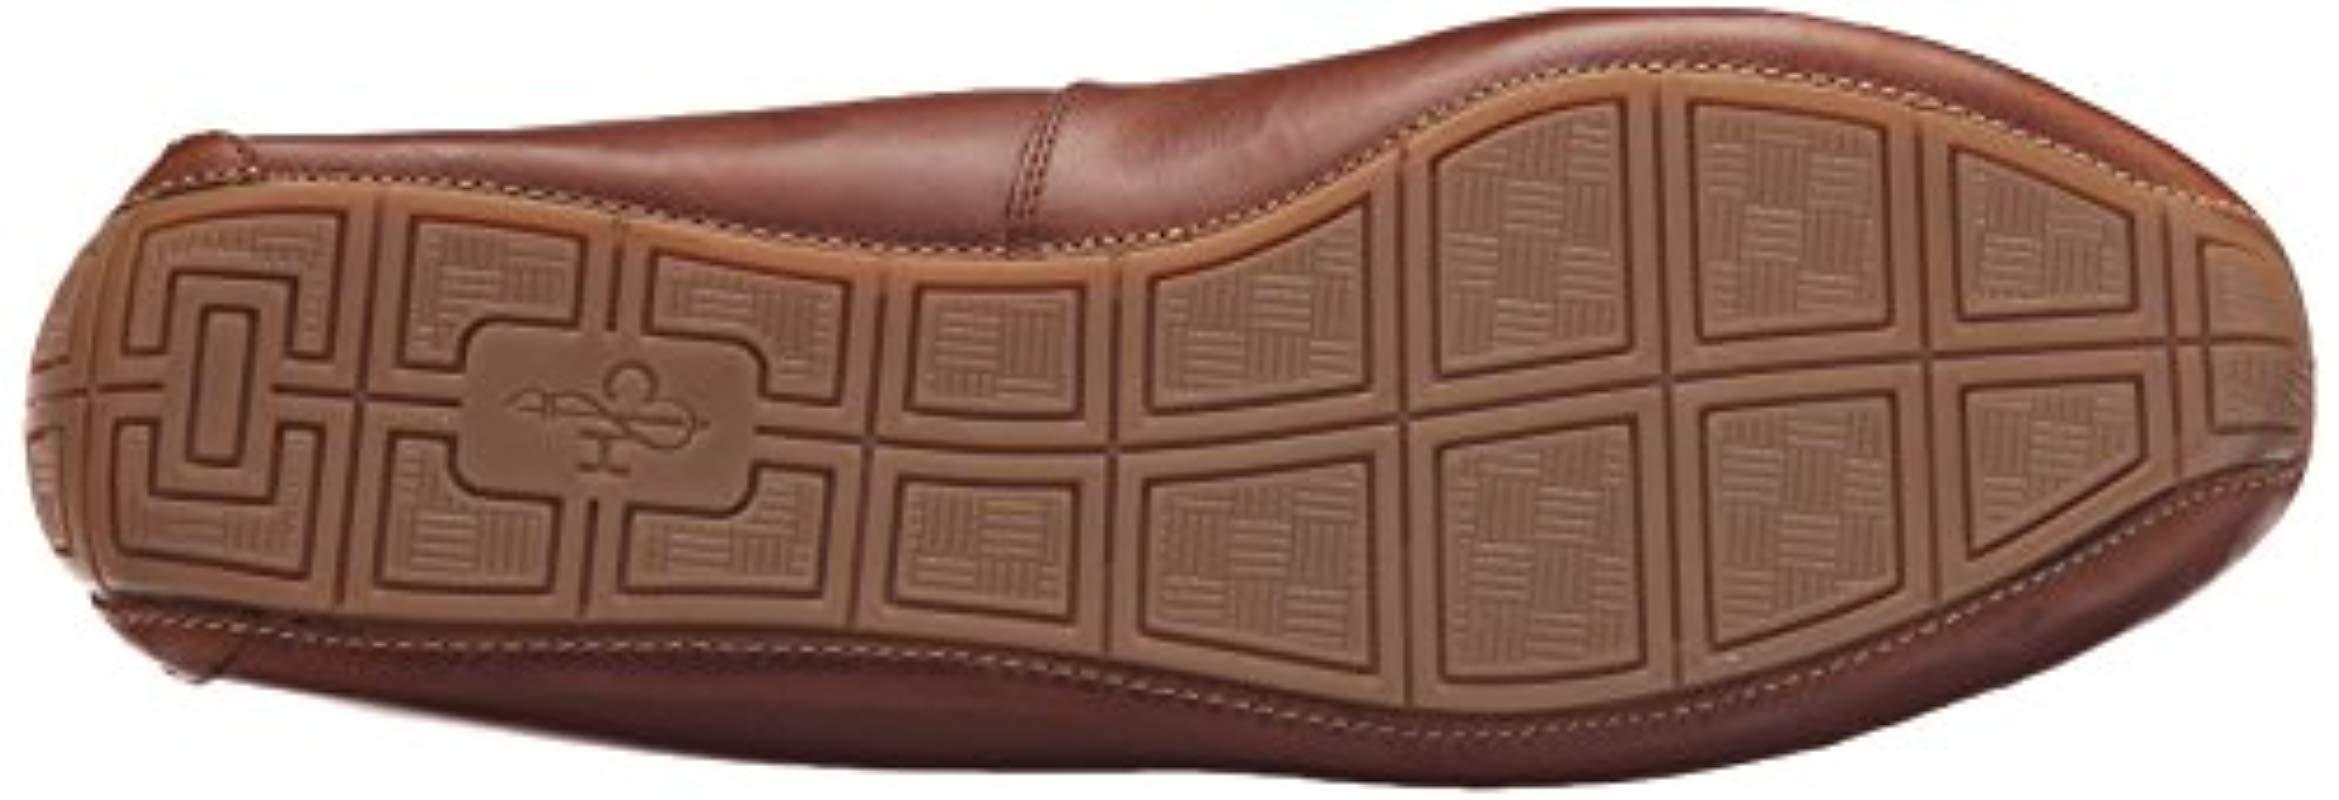 97f3004093d Cole Haan - Brown S Somerset Venetian Loafer for Men - Lyst. View fullscreen